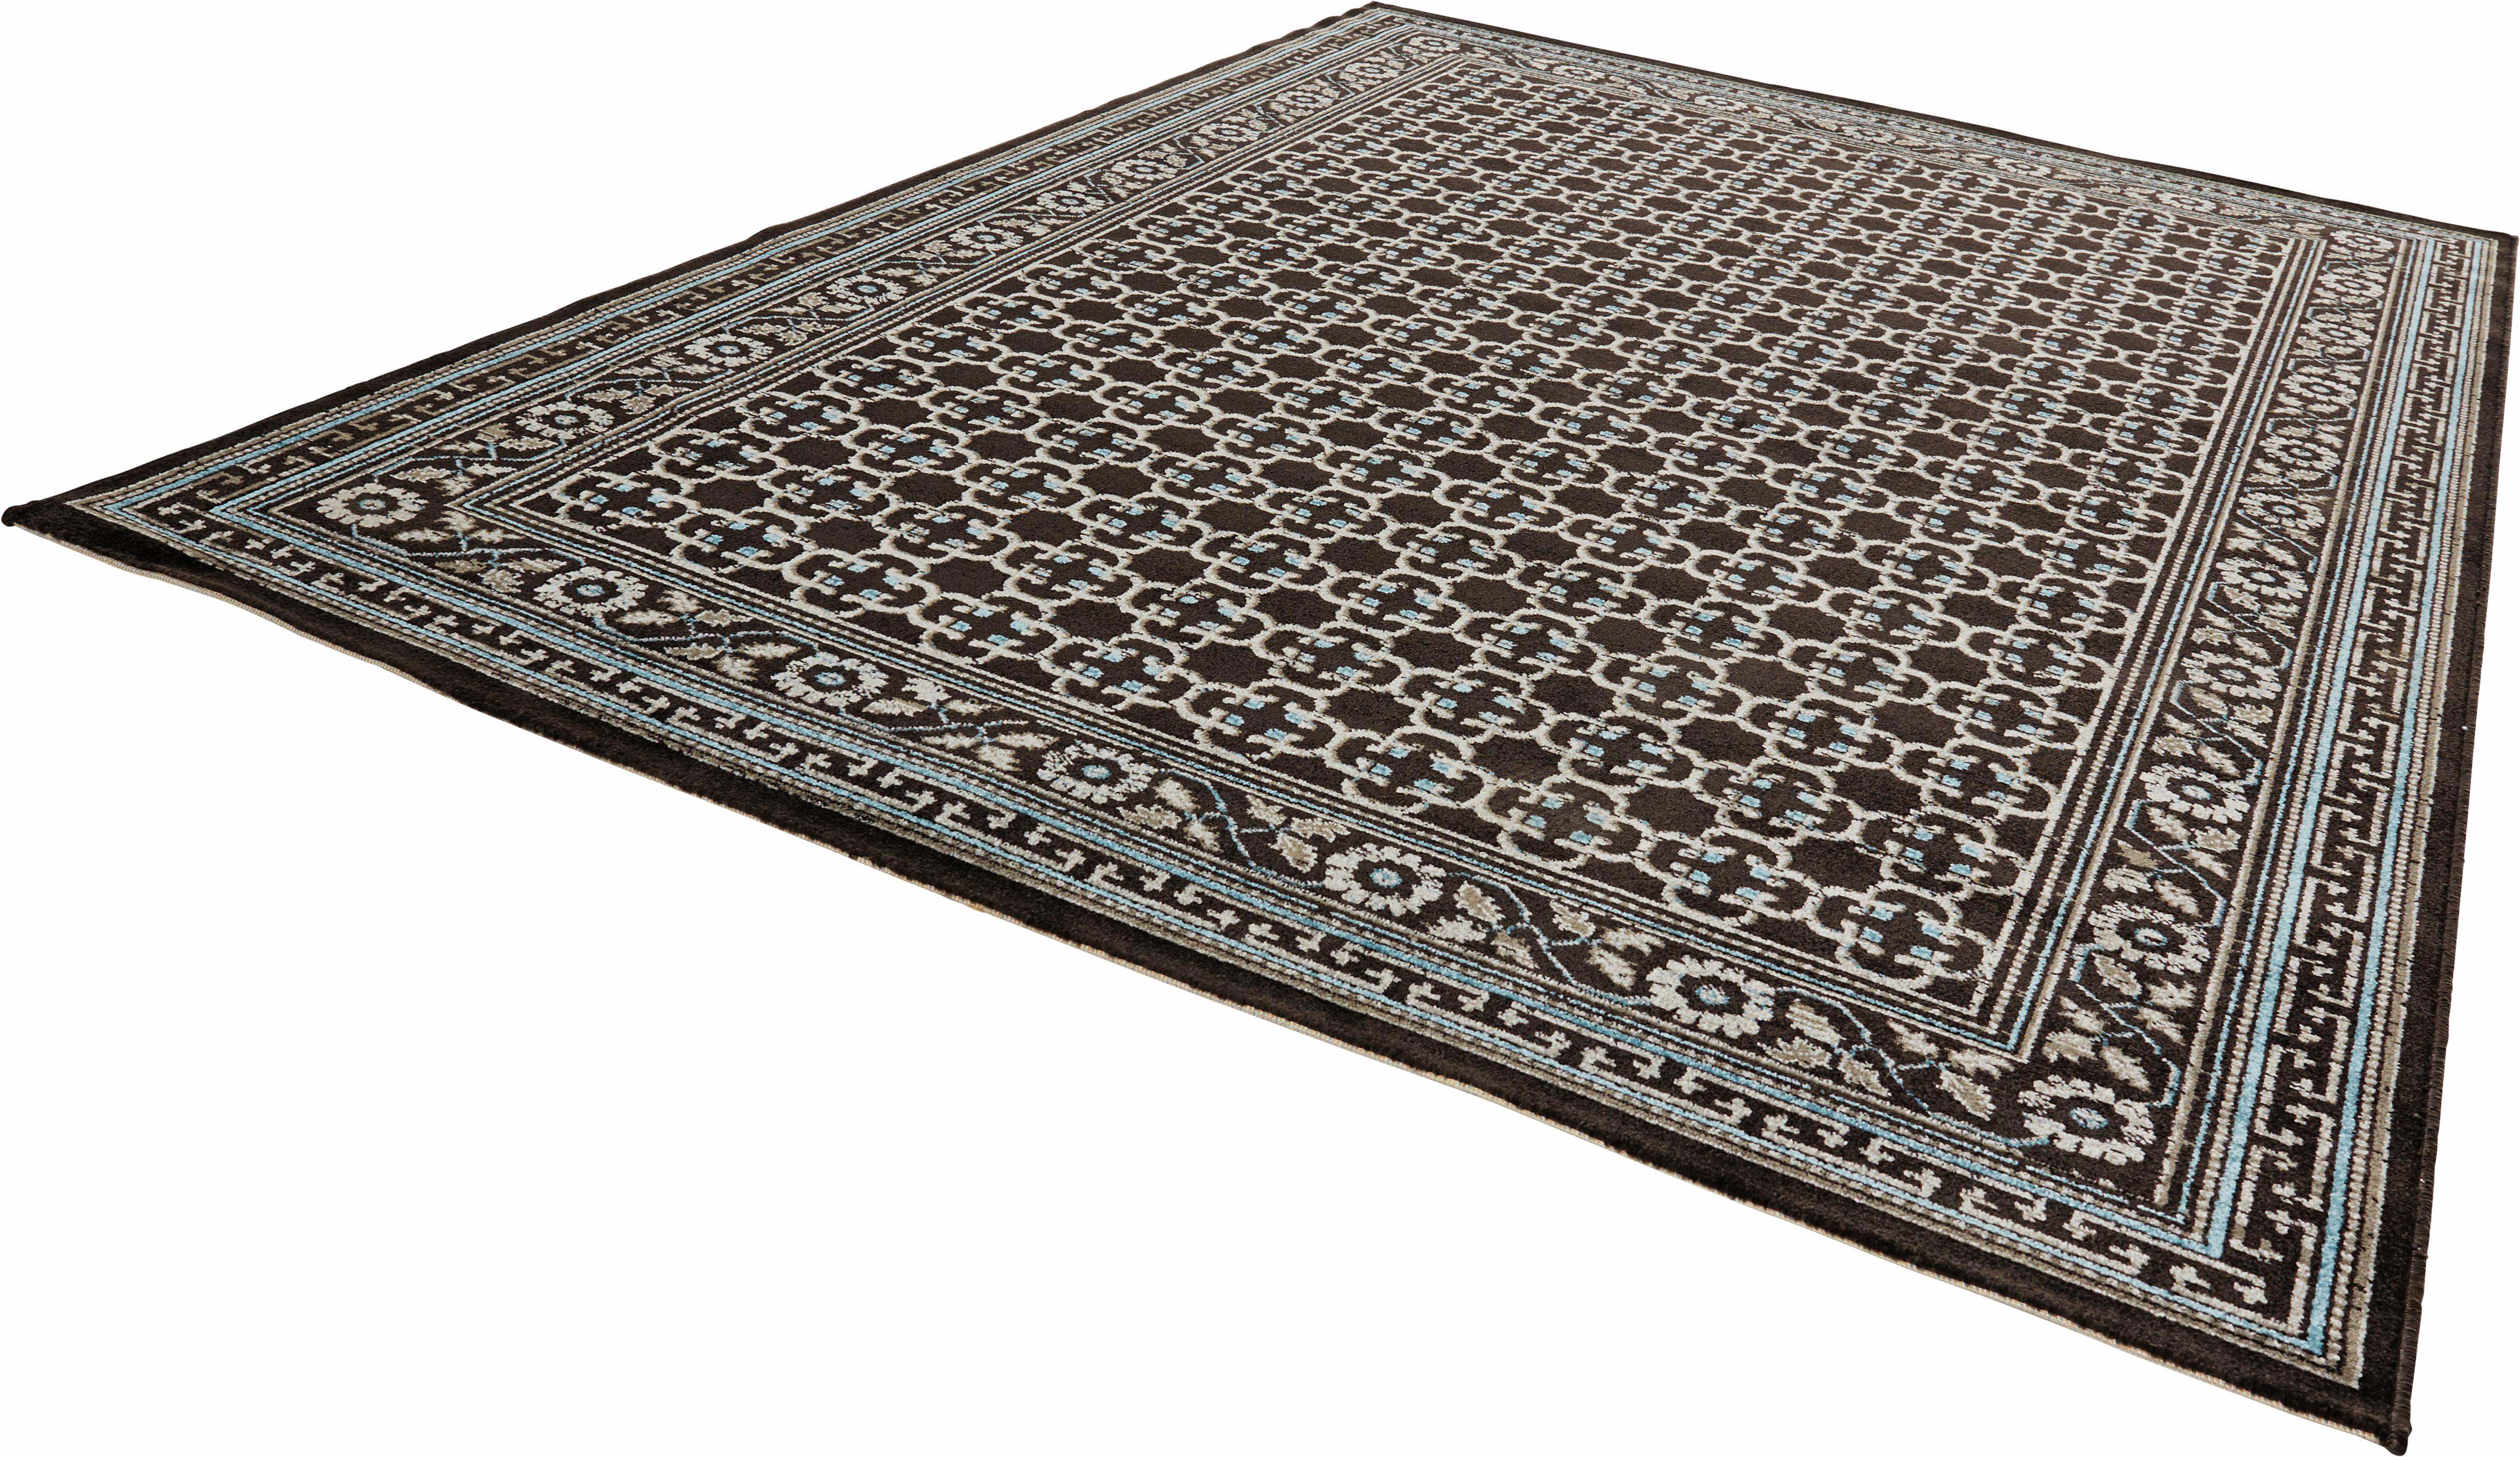 Teppich Kalypso MINT RUGS rechteckig Höhe 5 mm